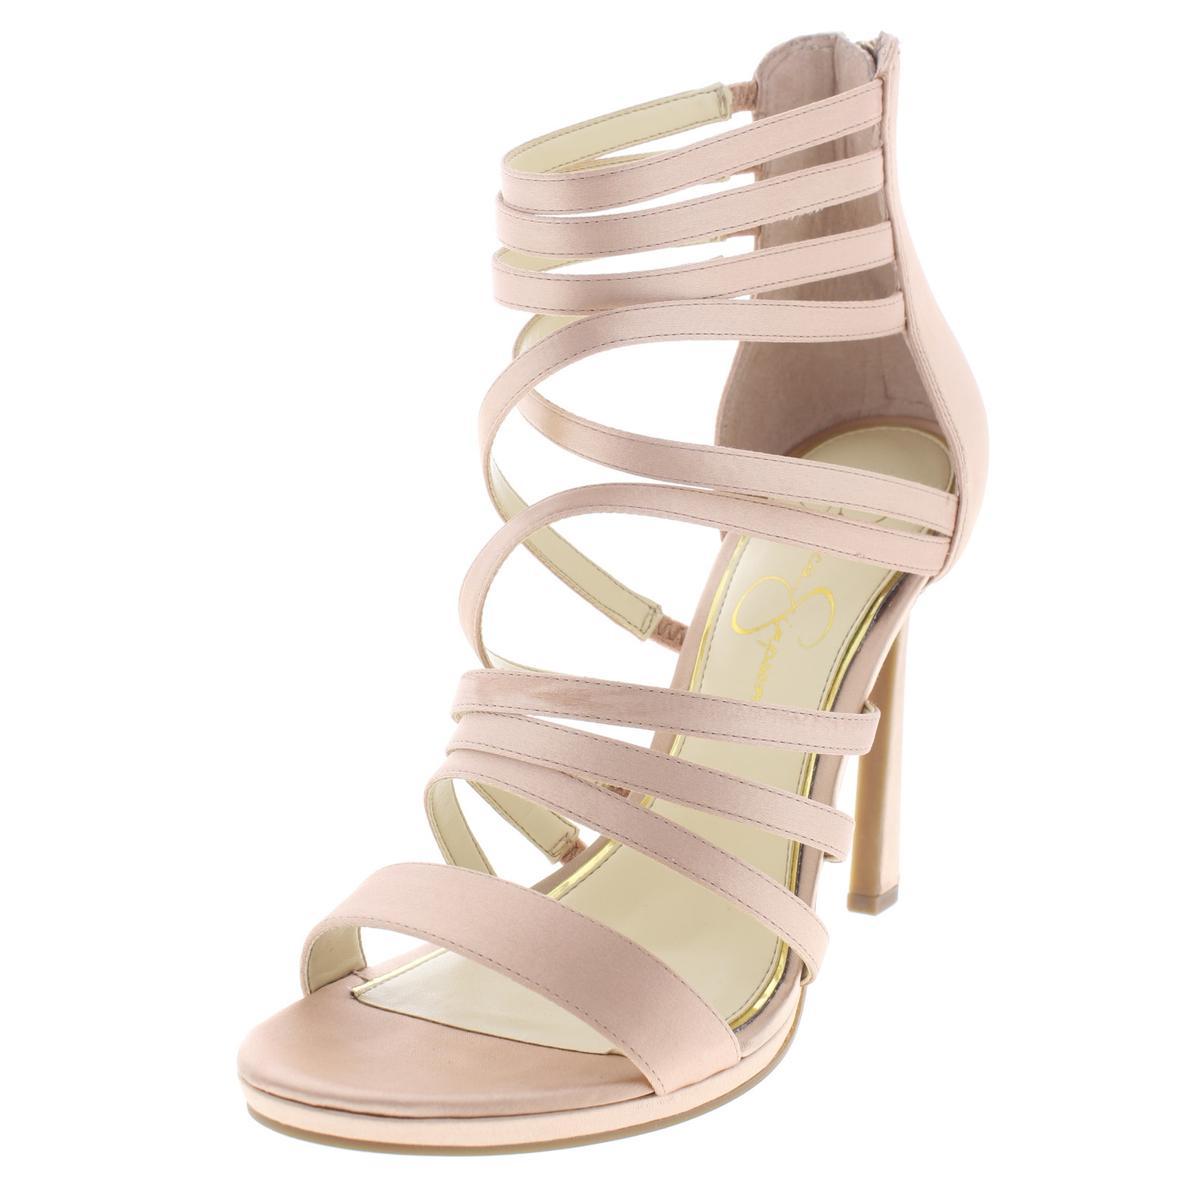 Jessica Simpson Damenschuhe Palkaya Padded Insole Dress 5823 Sandales Schuhes BHFO 5823 Dress 0bc5a8